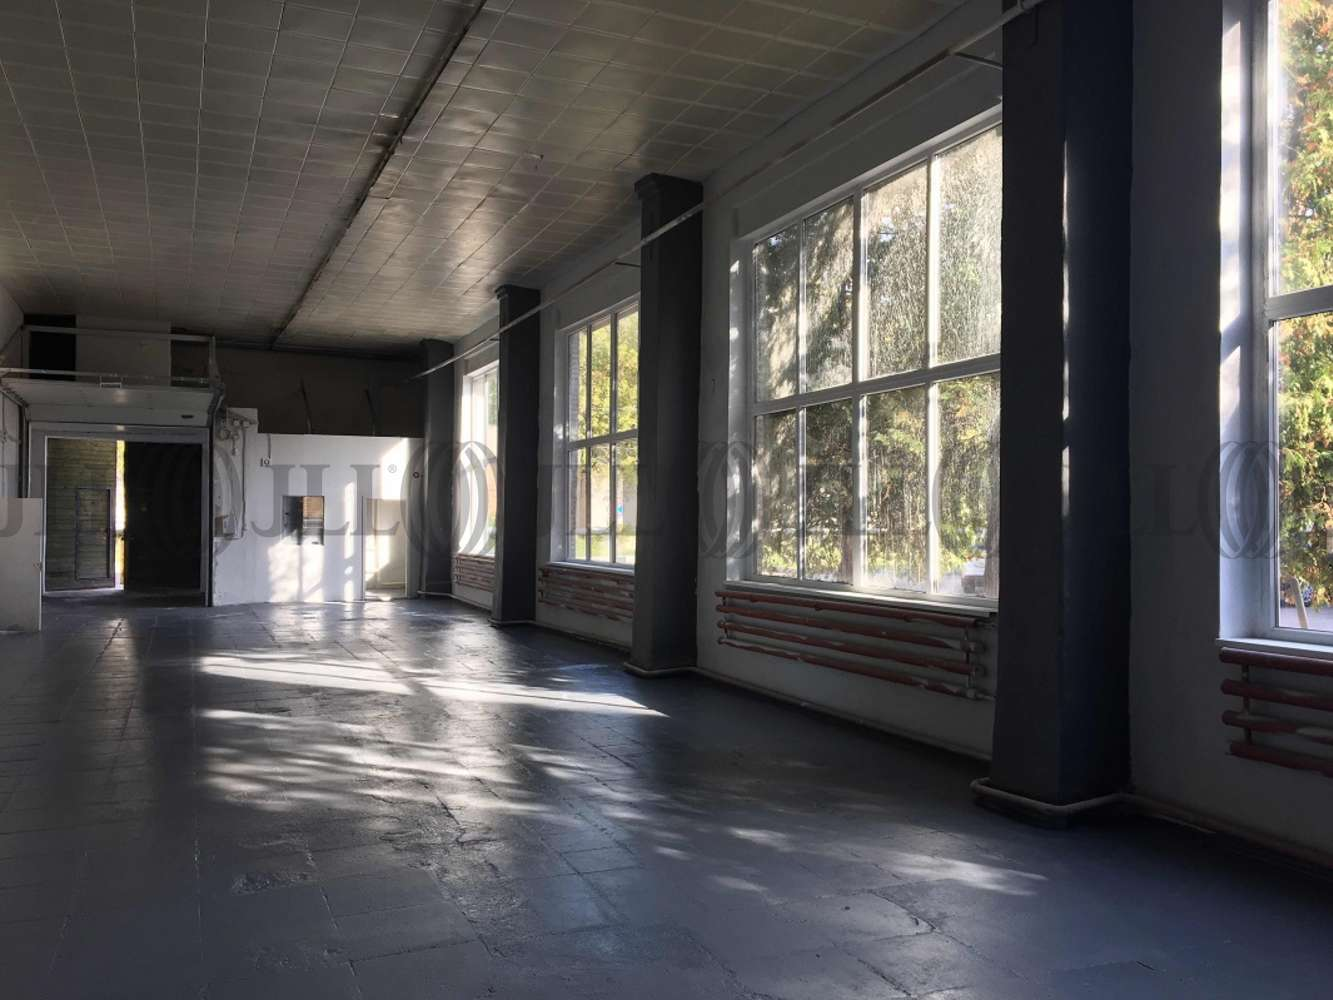 Офисная недвижимость Москва - Калева Парк Технопарк Мосрентген